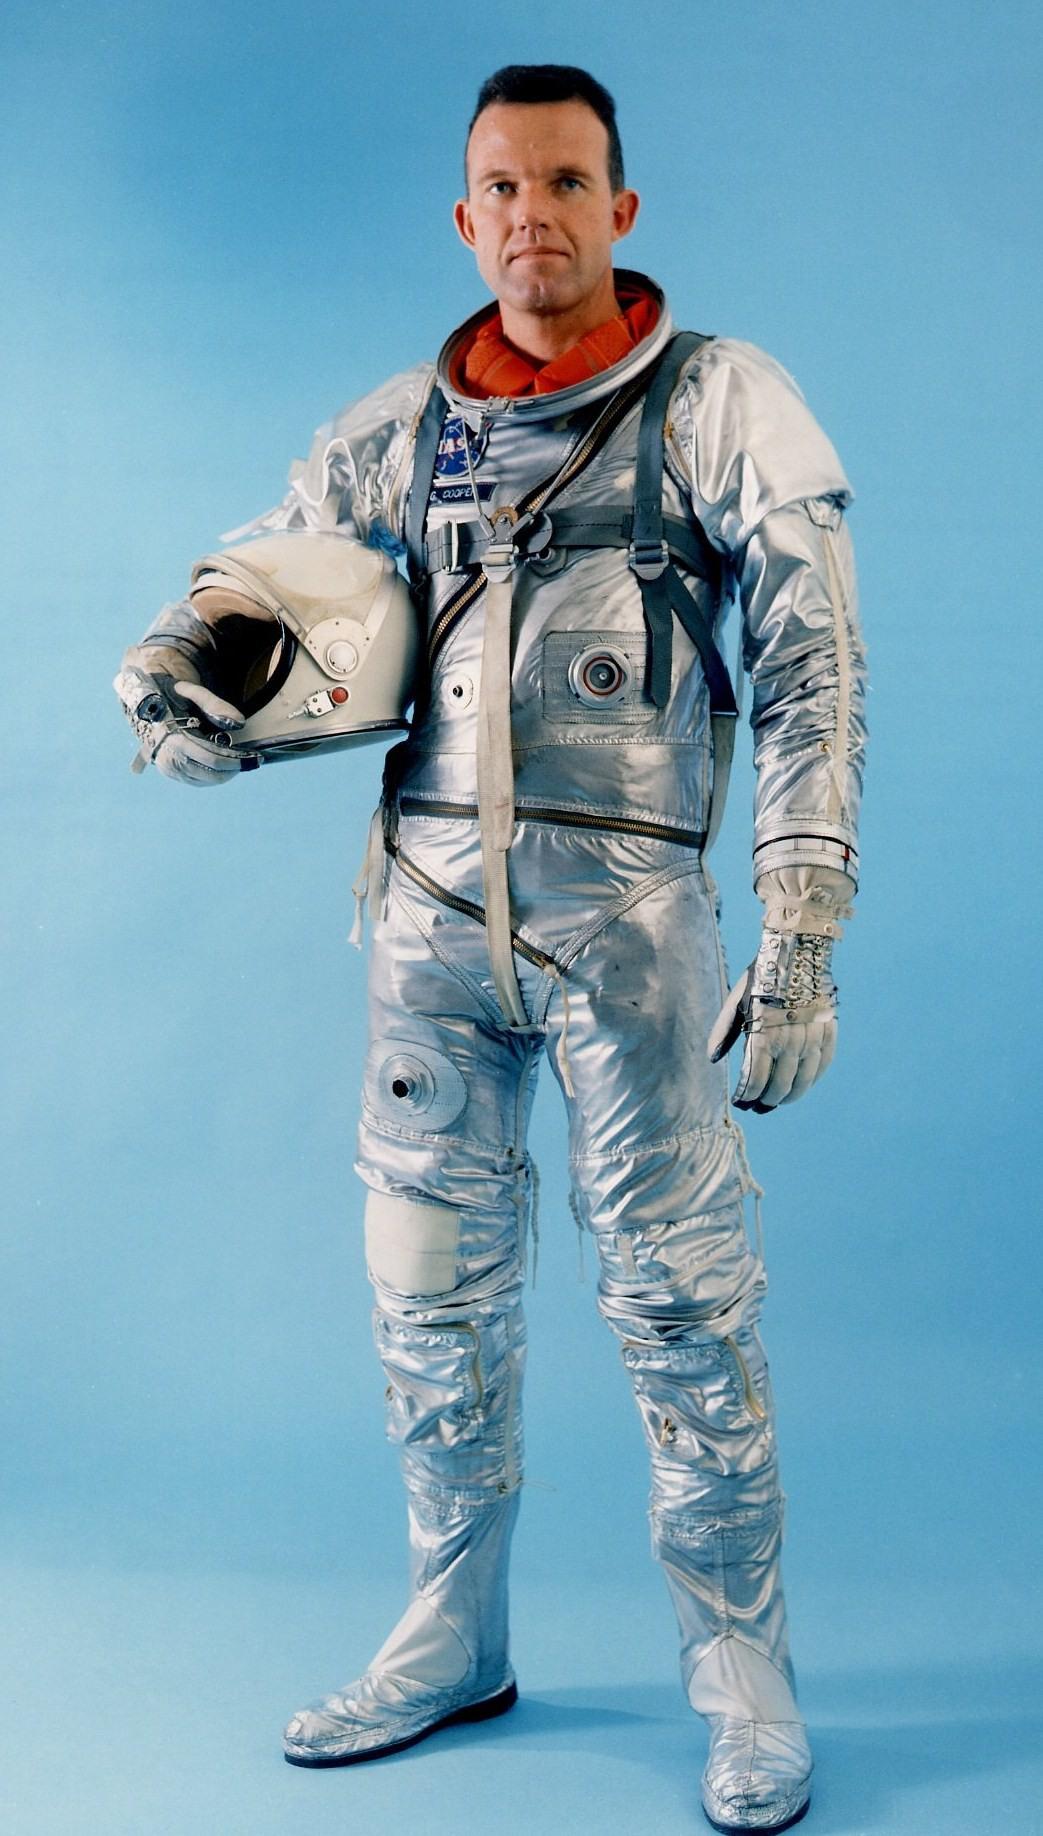 Astronaut Gordon Cooper wearing a Mercury spacesuit